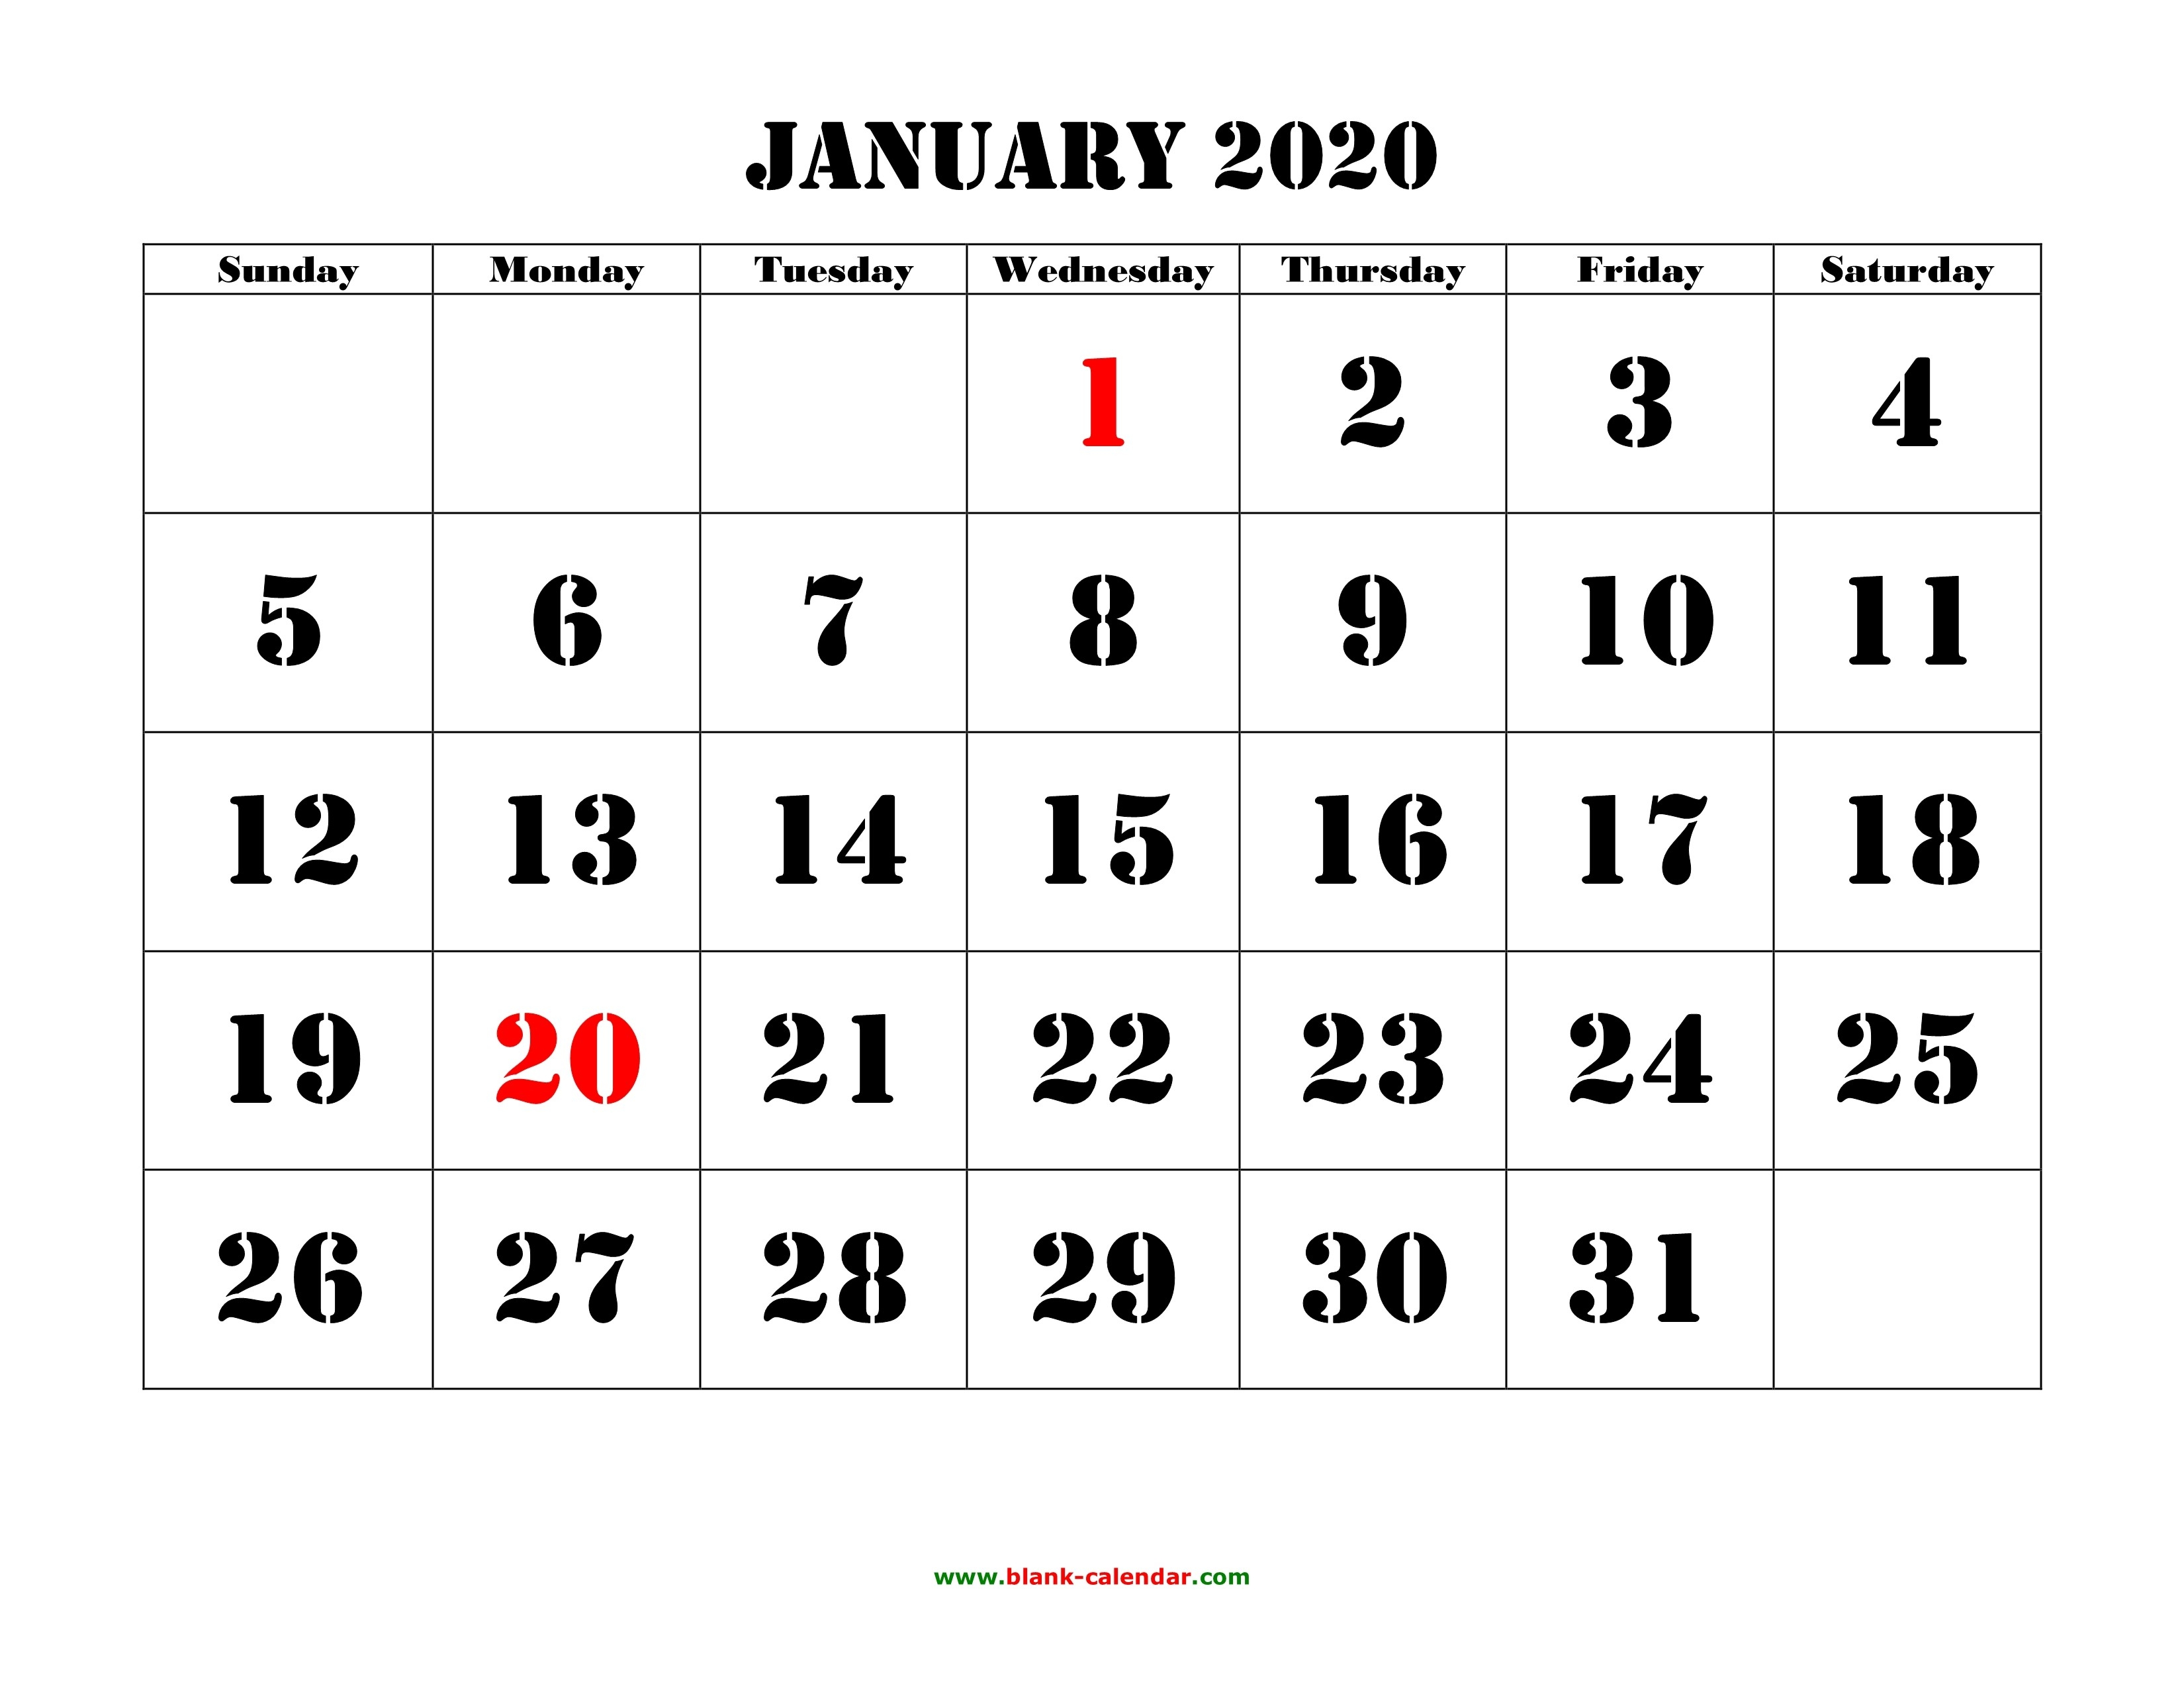 Printable January 2020 Calendar - Free Blank Templates-Blank W 9 To Print 2020